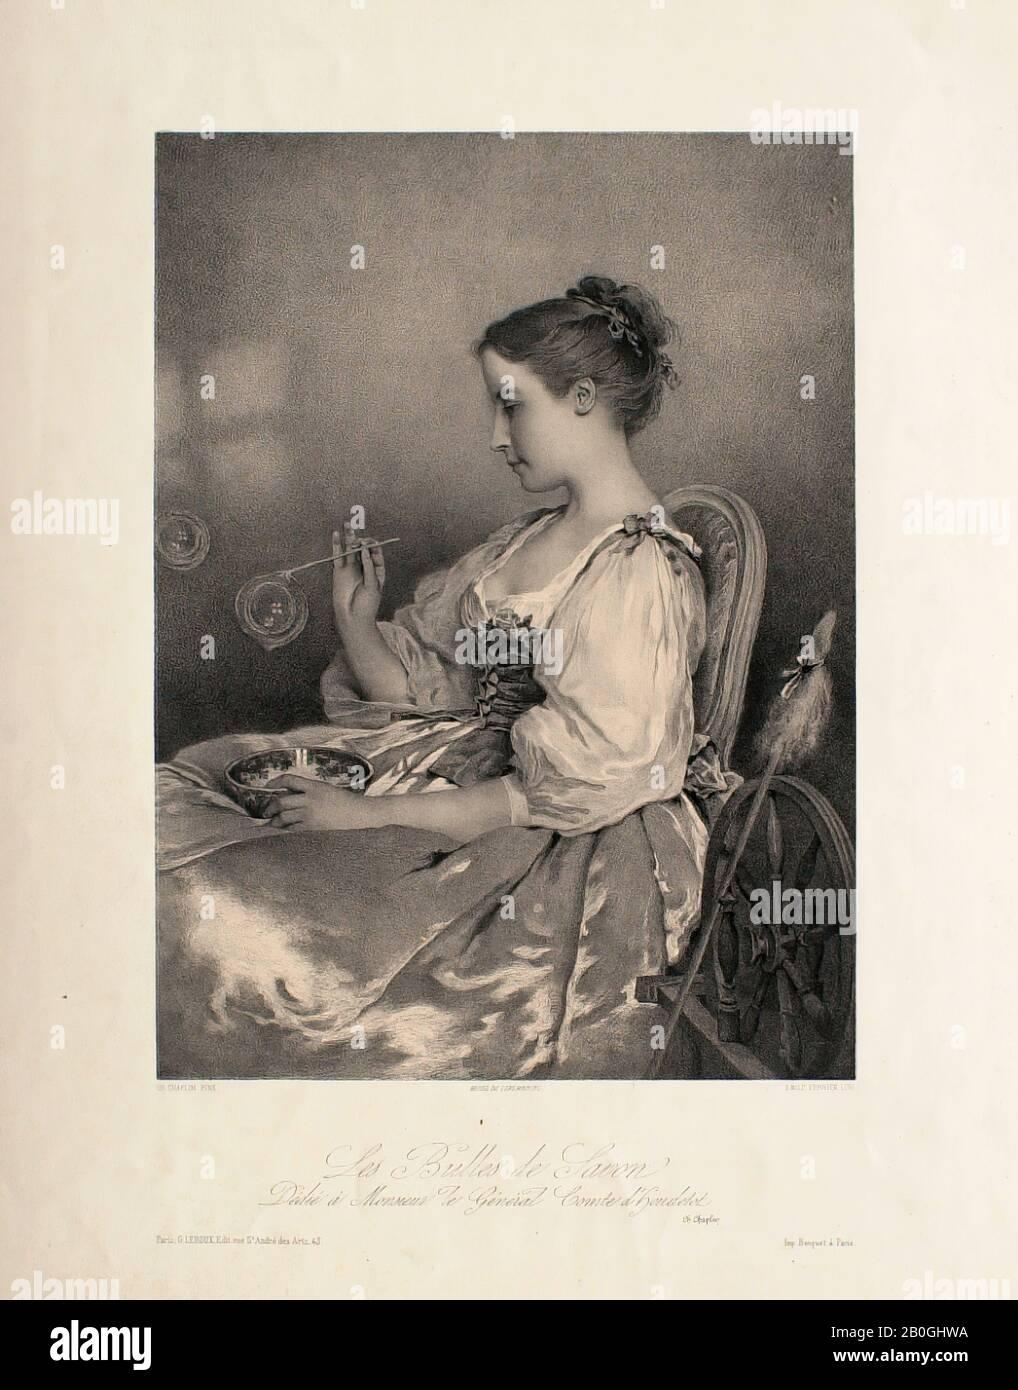 Mary Chaplin Artiste Peintre 1839 1887 stock photos & 1839 1887 stock images - alamy